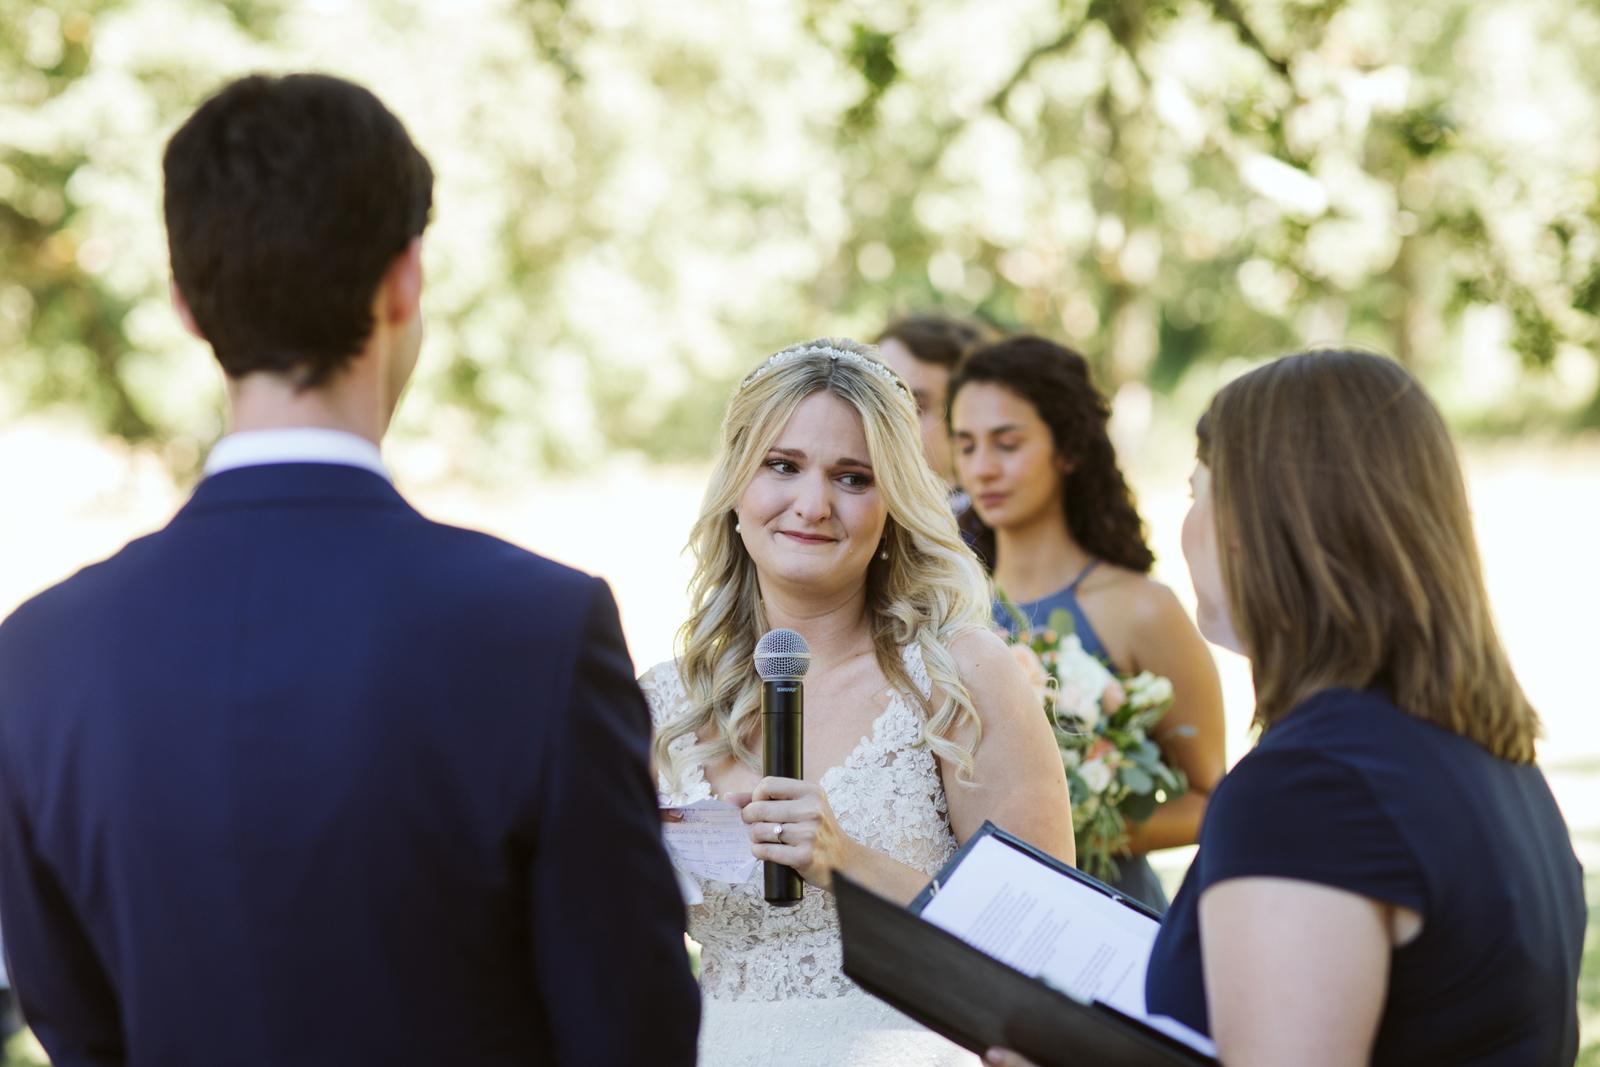 055-daronjackson-rachel-michael-wedding-mtpisgah.jpg